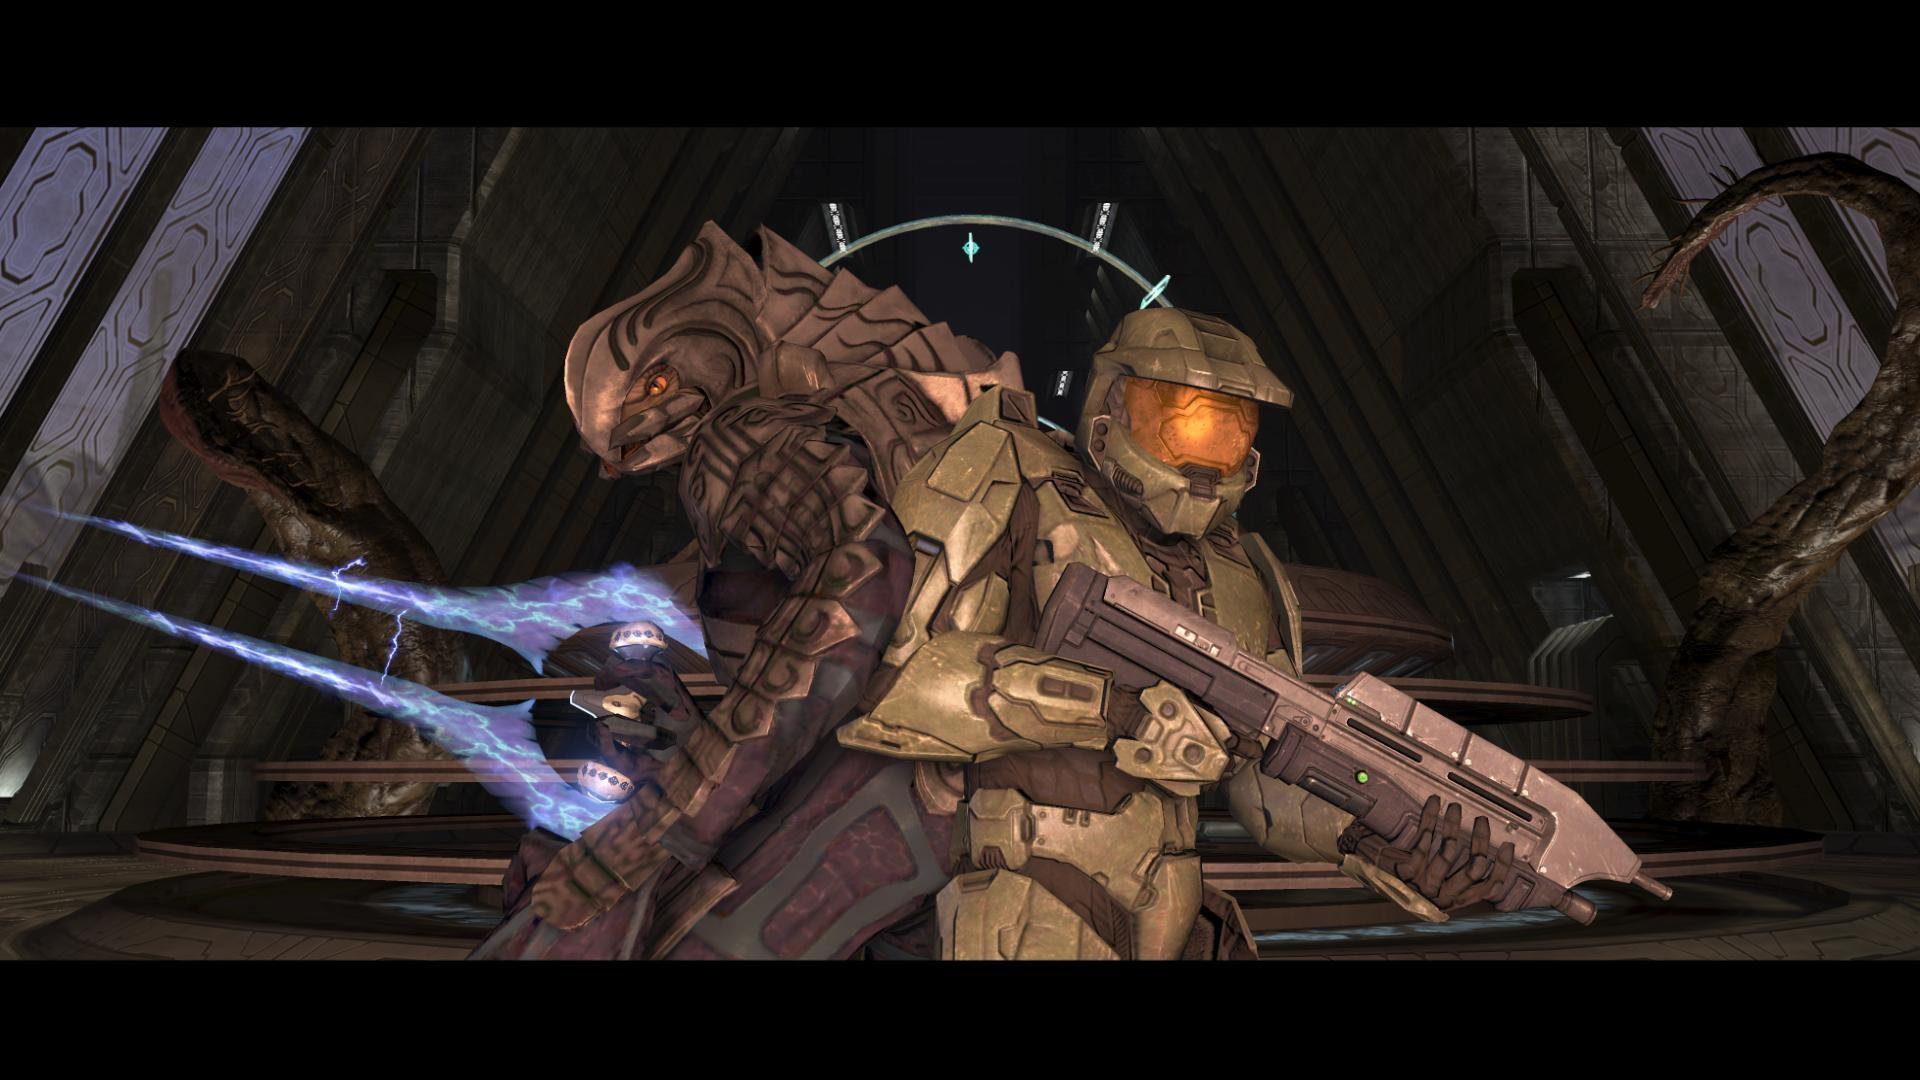 Halo 3 Master Chief And Arbiter wallpaper 250393